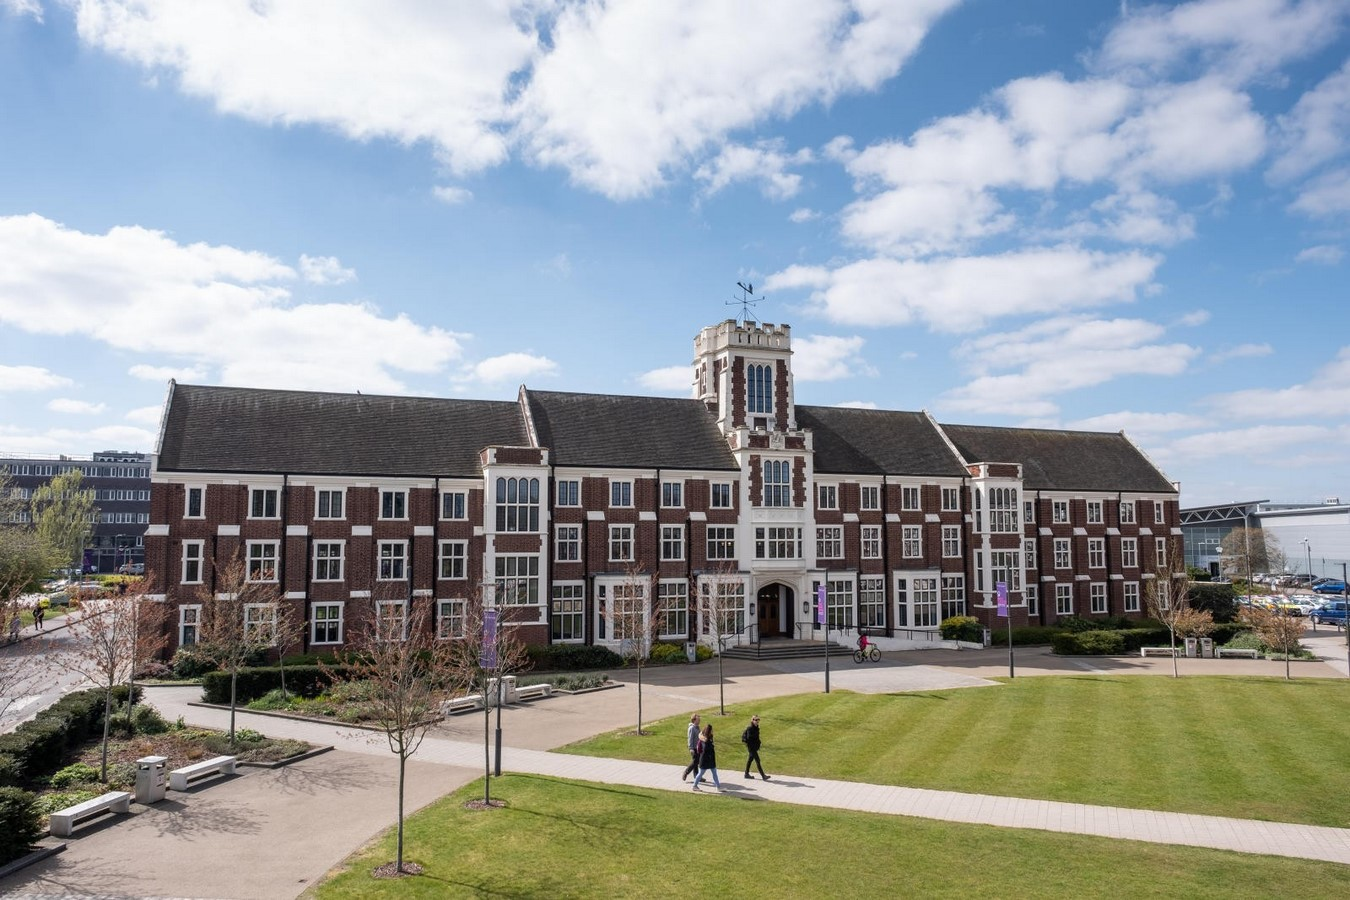 15 Top universities in Europe for Masters in Design - Sheet9